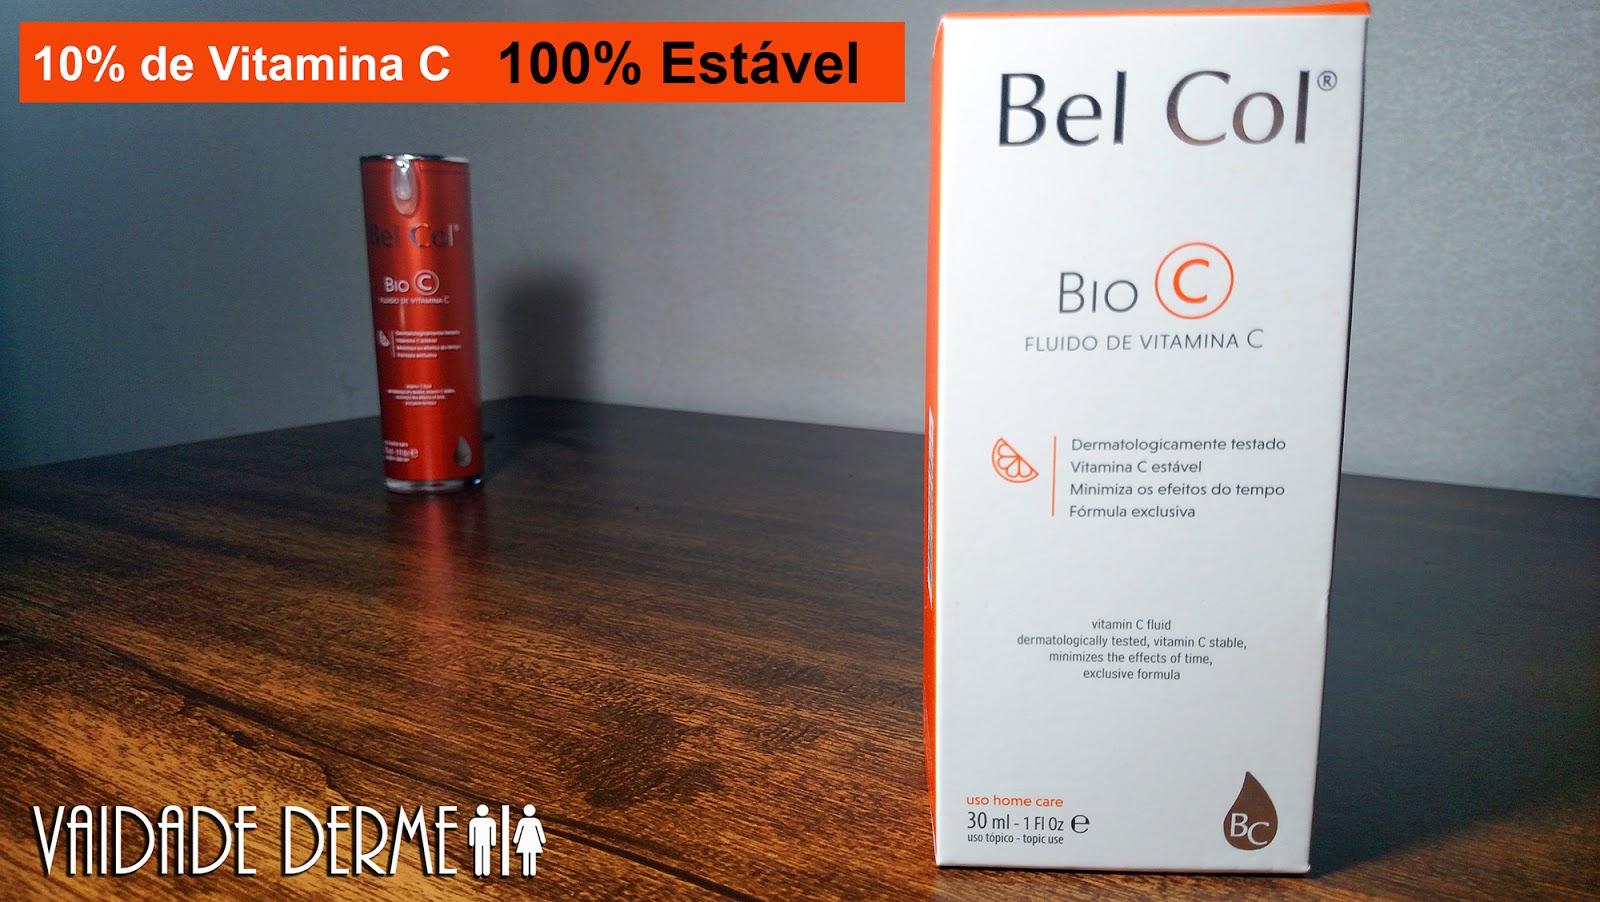 Bel Col Bio C